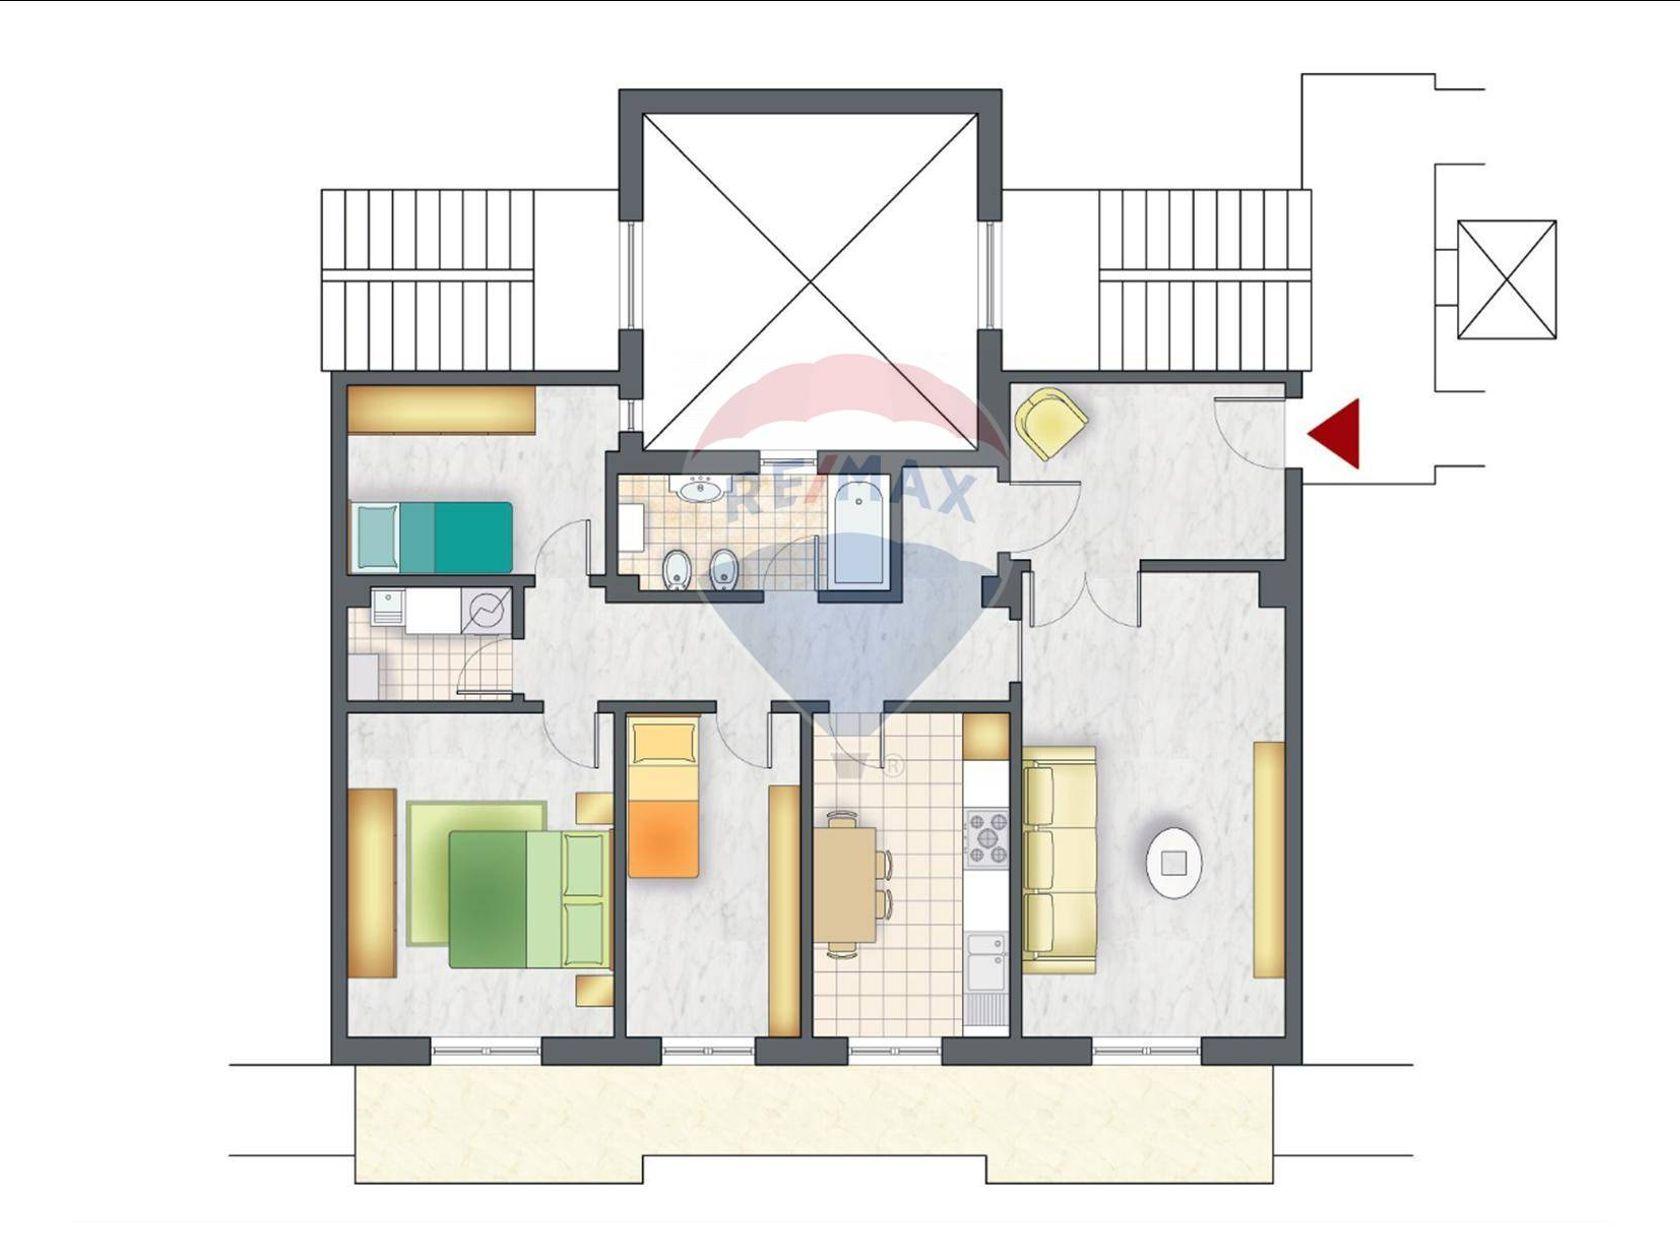 Appartamento Zona Ospedale, Pescara, PE Vendita - Planimetria 2